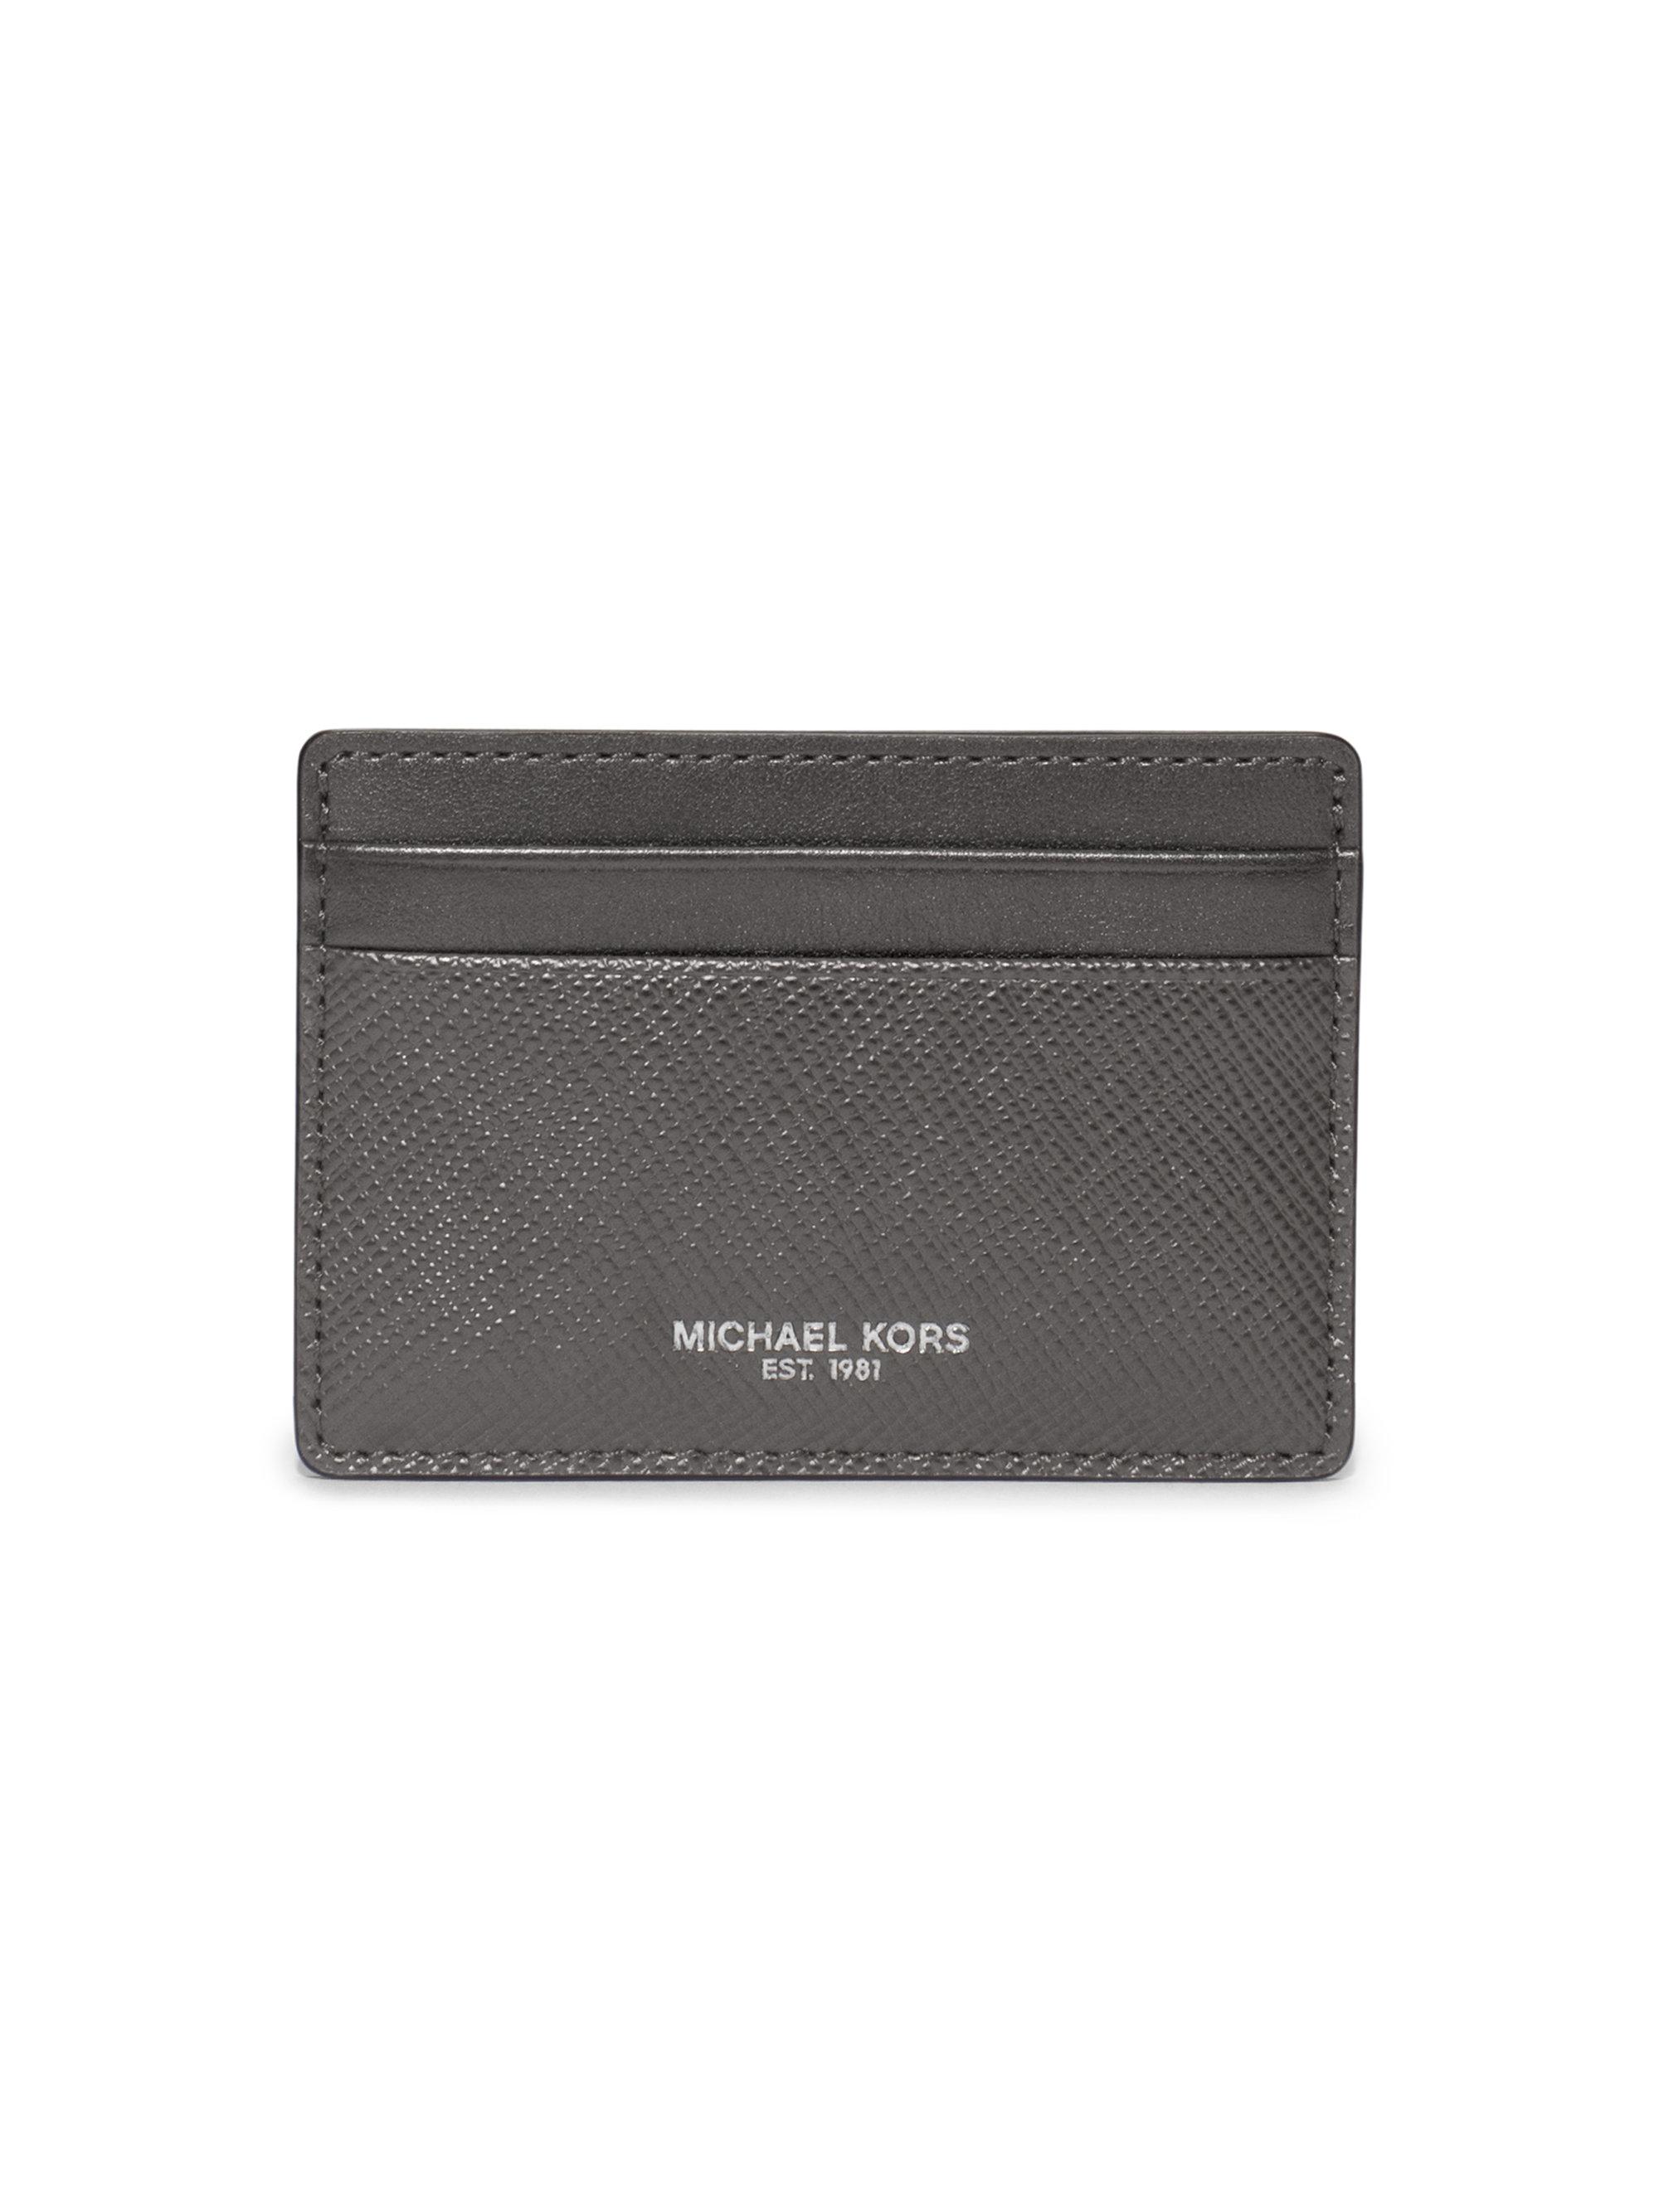 1d65f5fcedf6 michael kors mens leather card case and key fob set | Peninsula ...